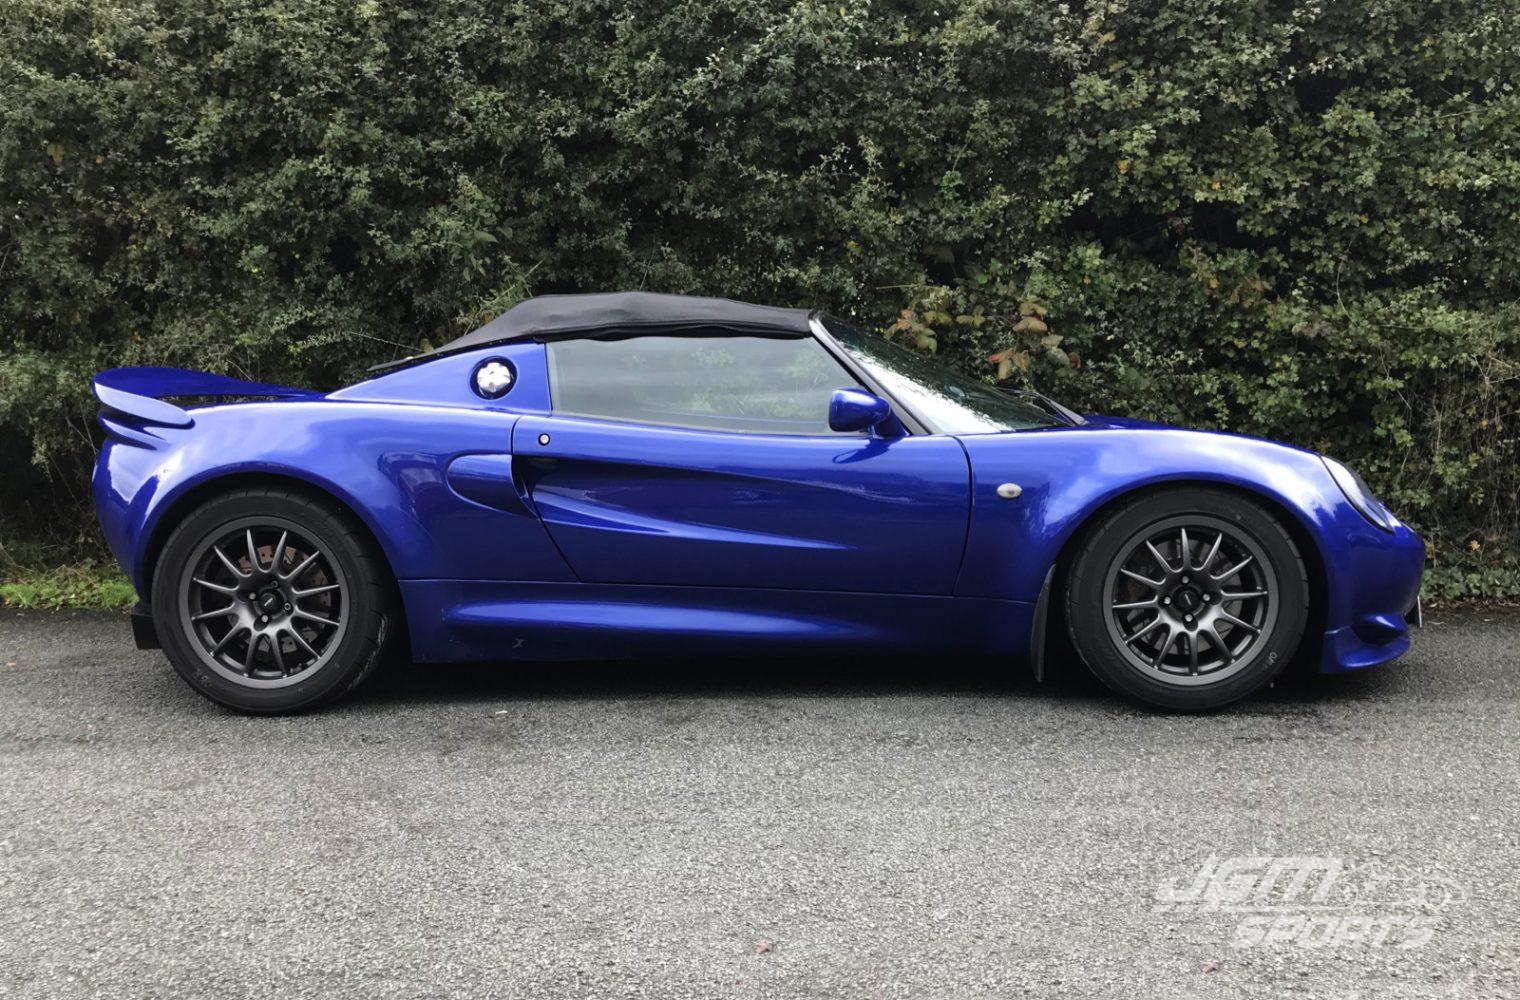 1998 S1 Lotus Elise Azure Blue Massive Spec Honda